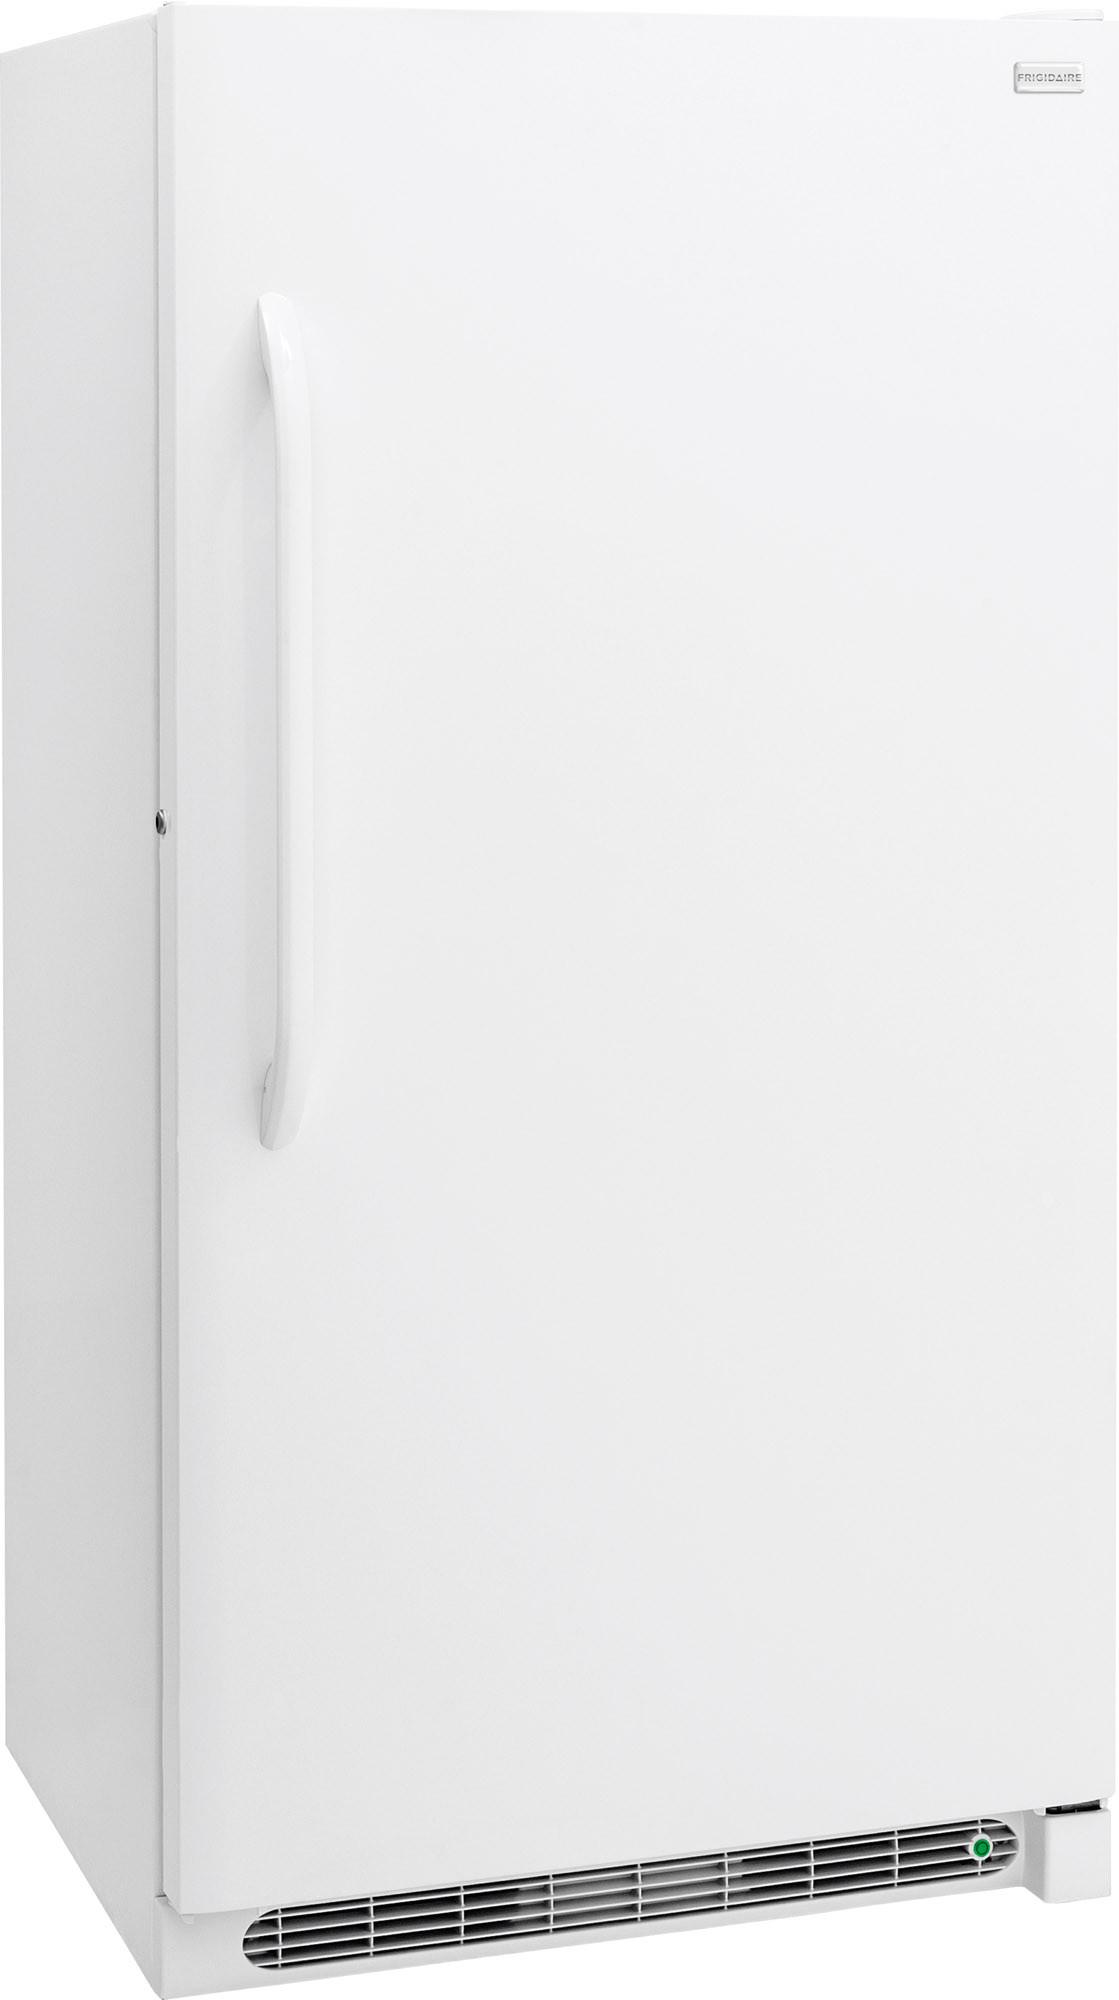 Ge Upright Freezer Manual Compact Freezers